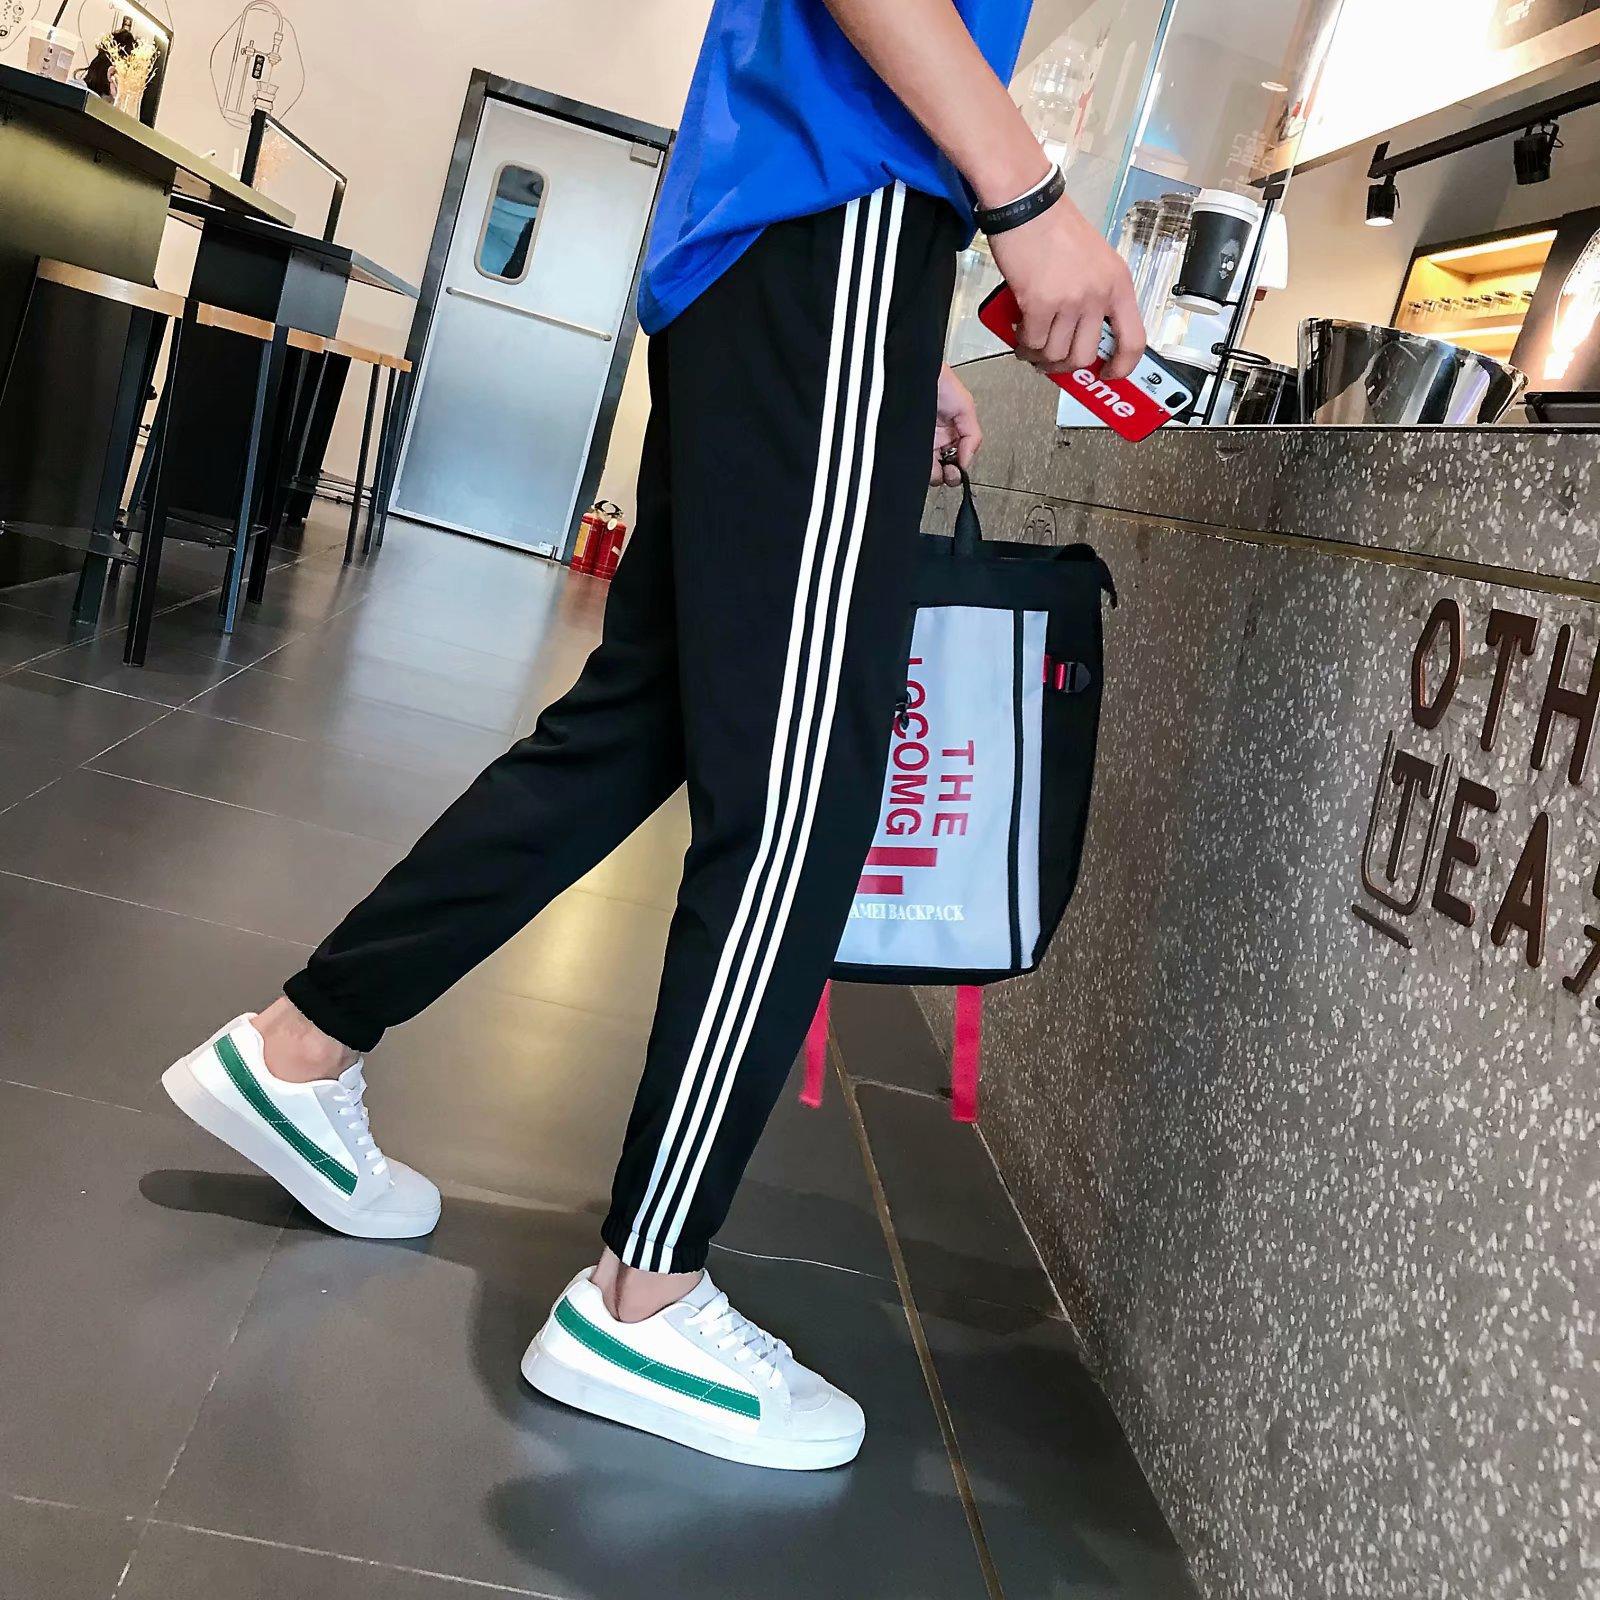 National Trends INS Three Bars Athletic Pants Men's Korean-style Trend Casual Pants Versatile Students Stripes Capri Sweatpants